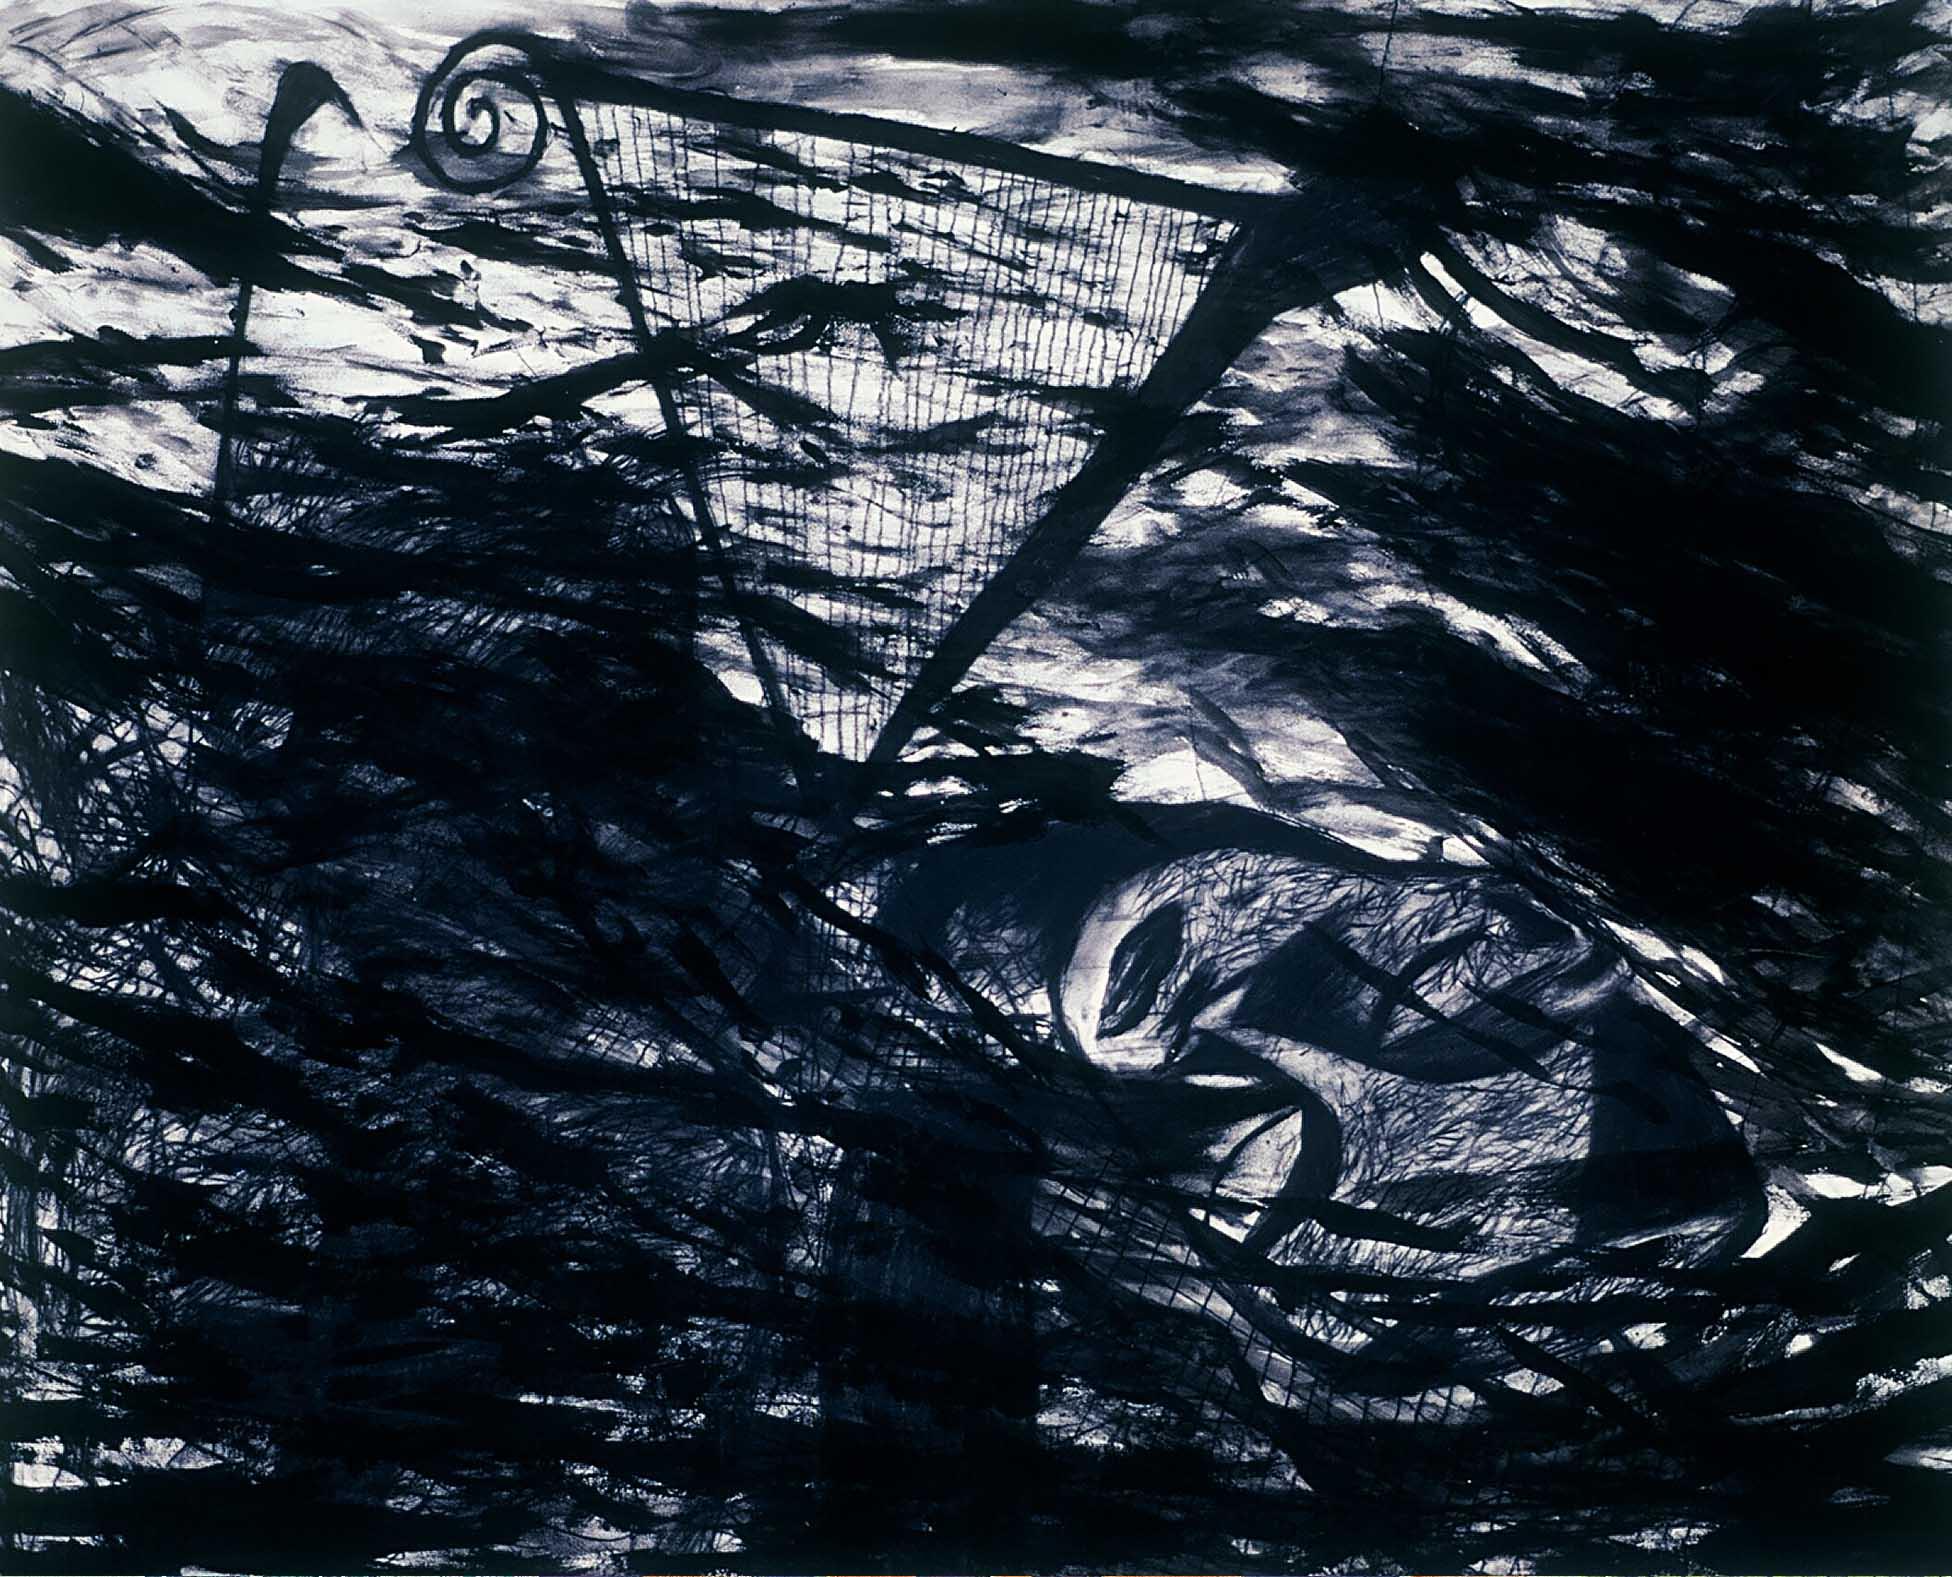 Drowned Harpist